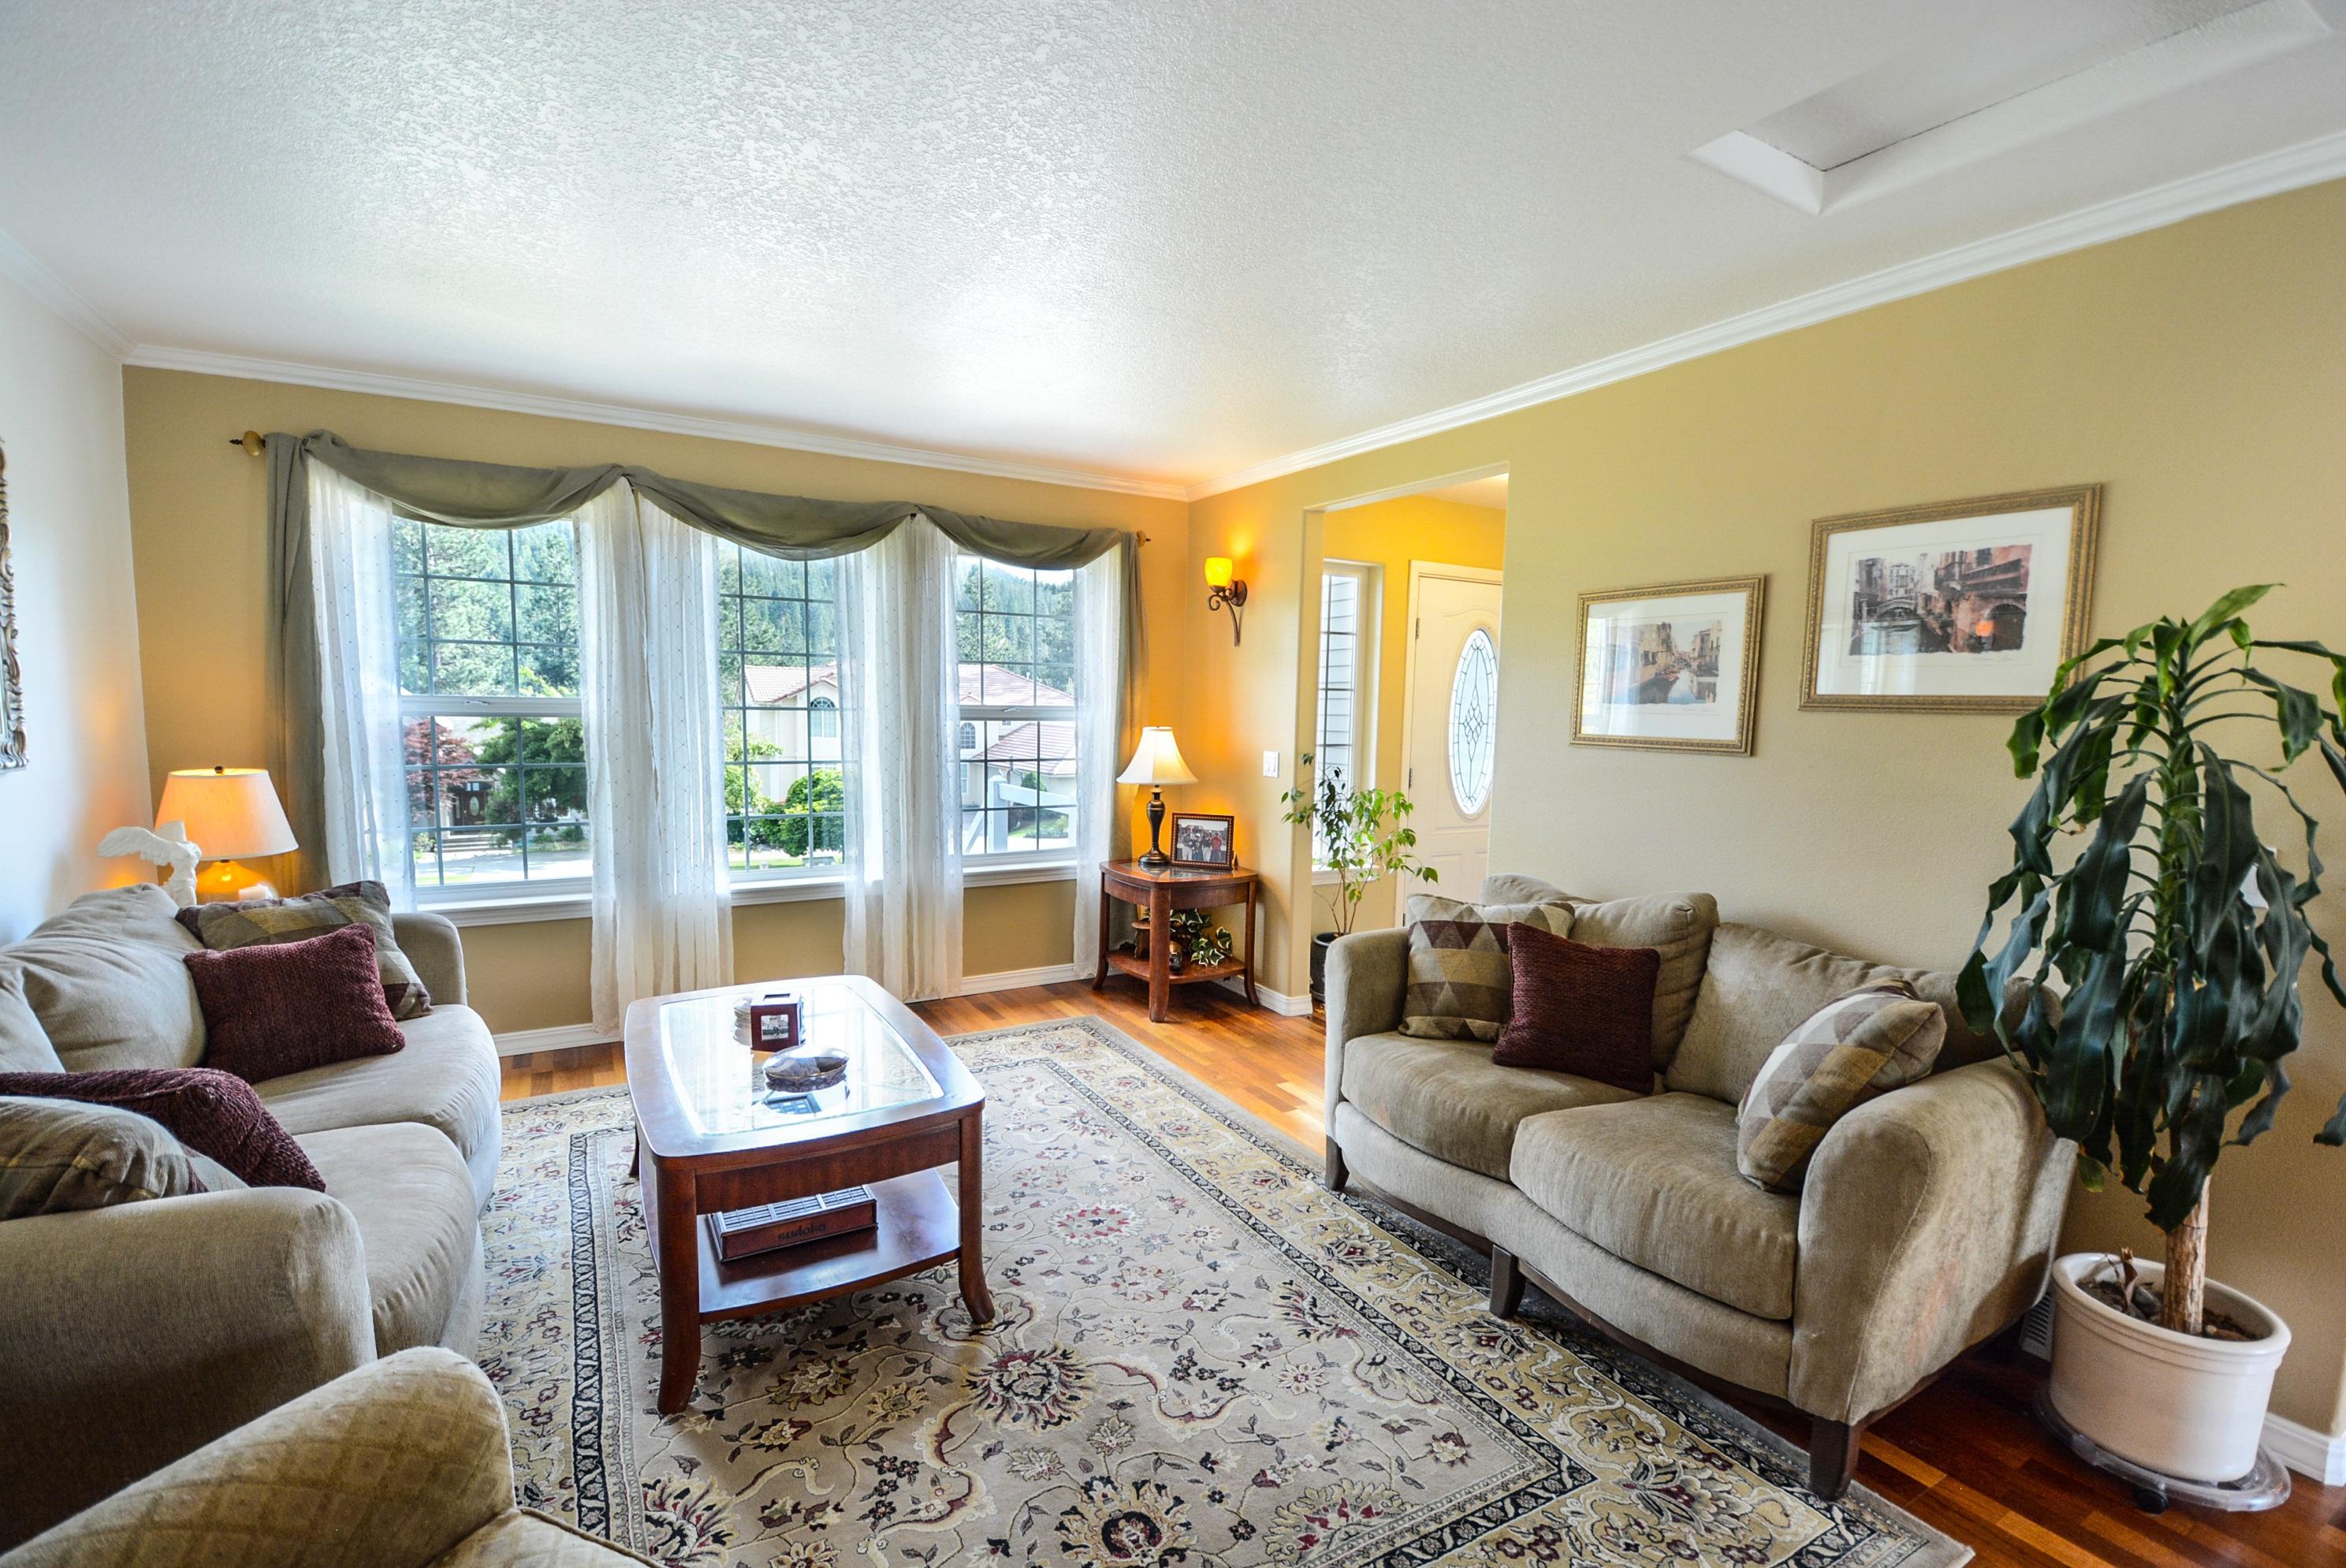 Gambar Vila Rumah Besar Lantai Pondok Milik Ruang Keluarga